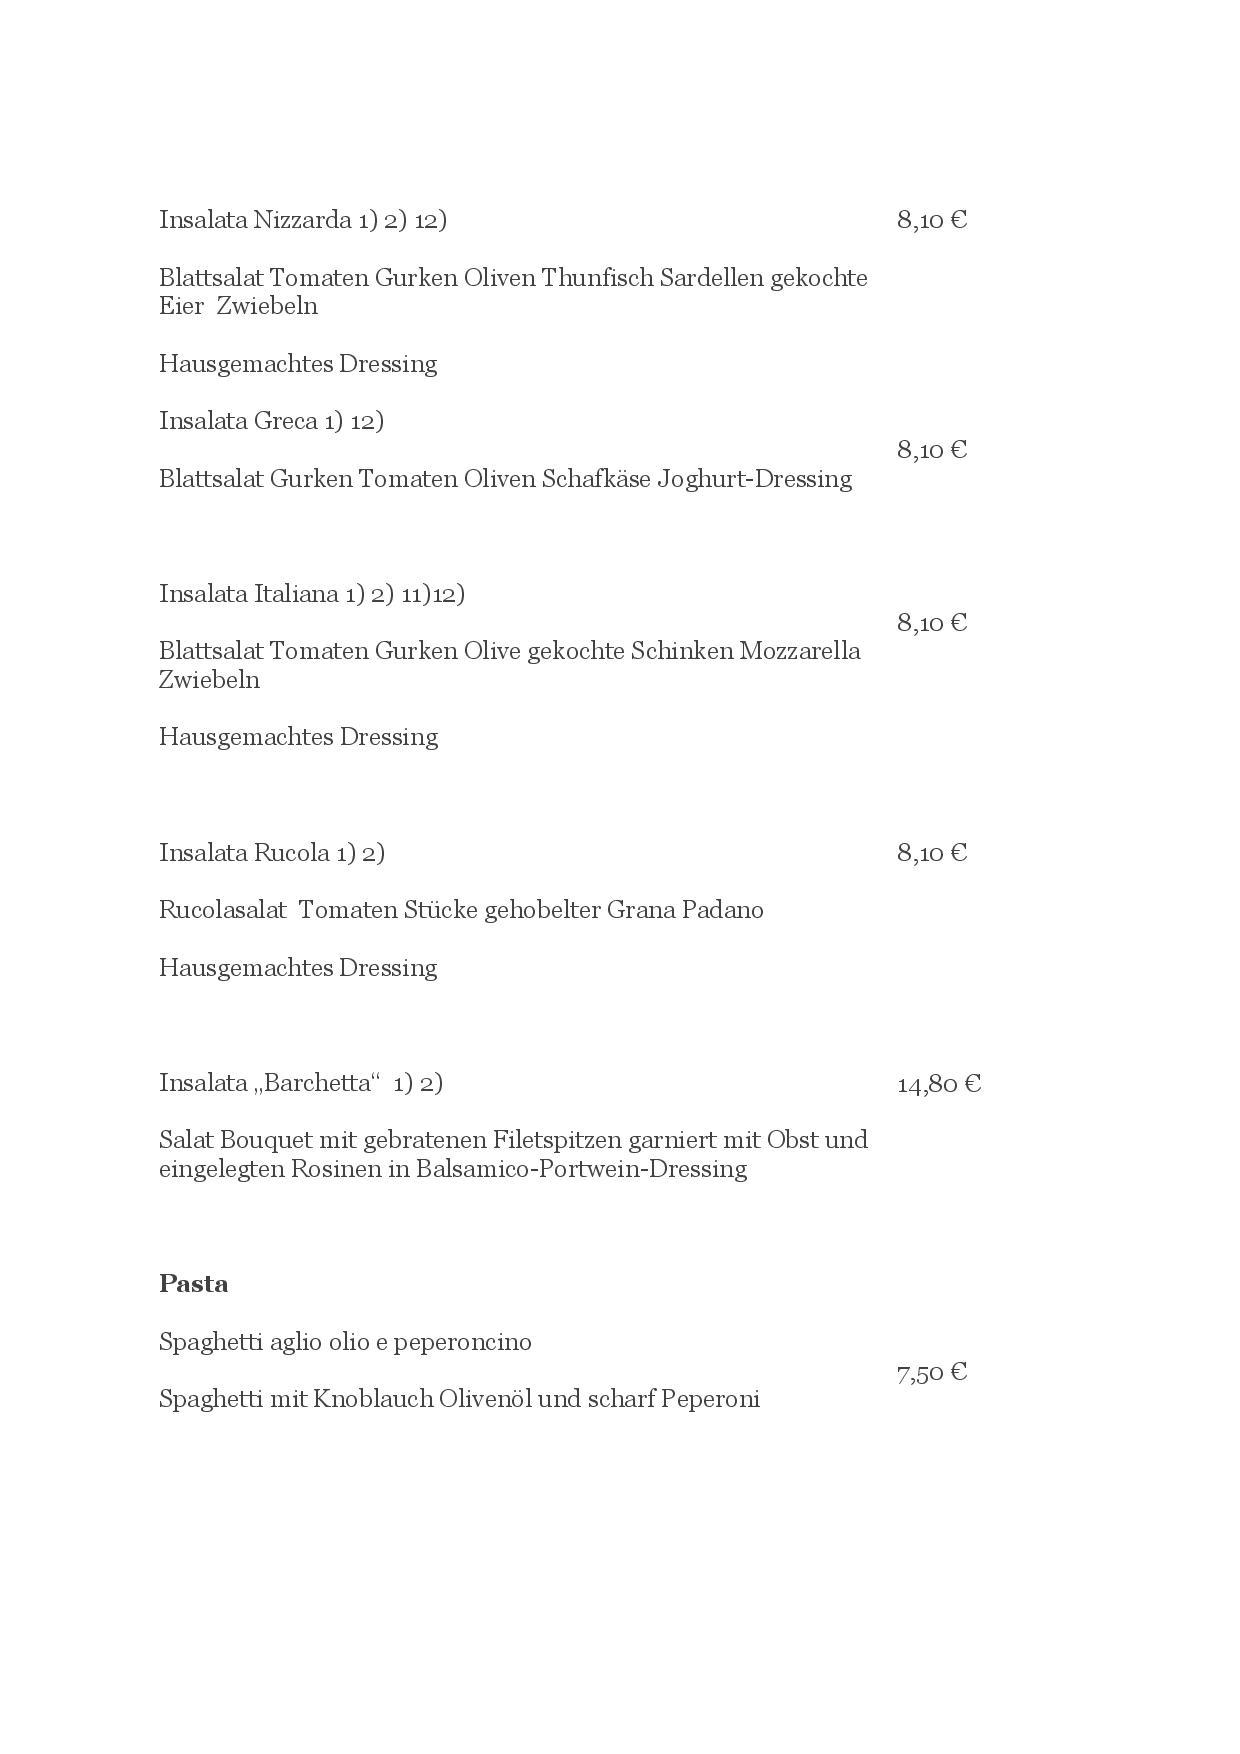 Speisekarte Baden Baden-page-002 (1)